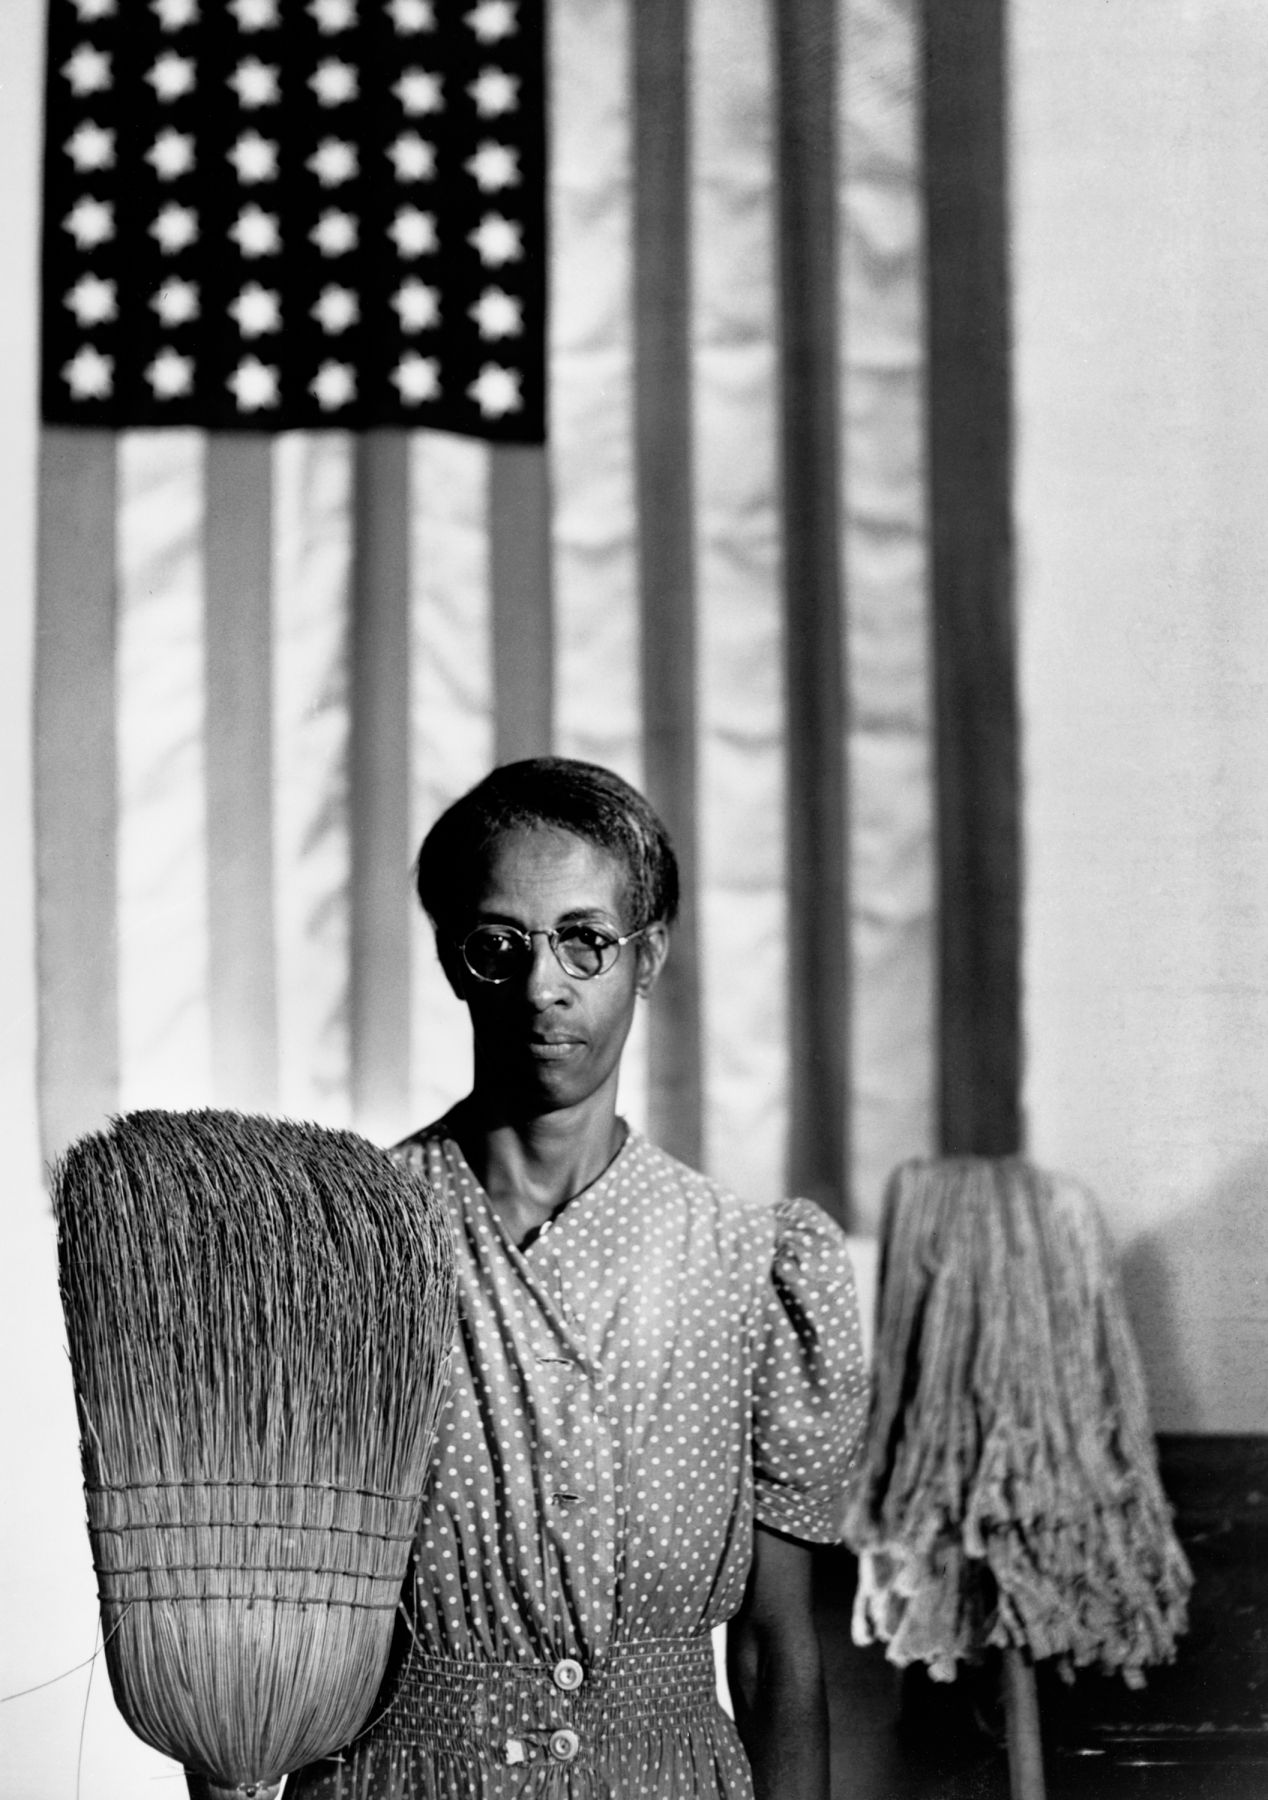 © Gordon Parks - American Gothic, Washington, D.C., 1942